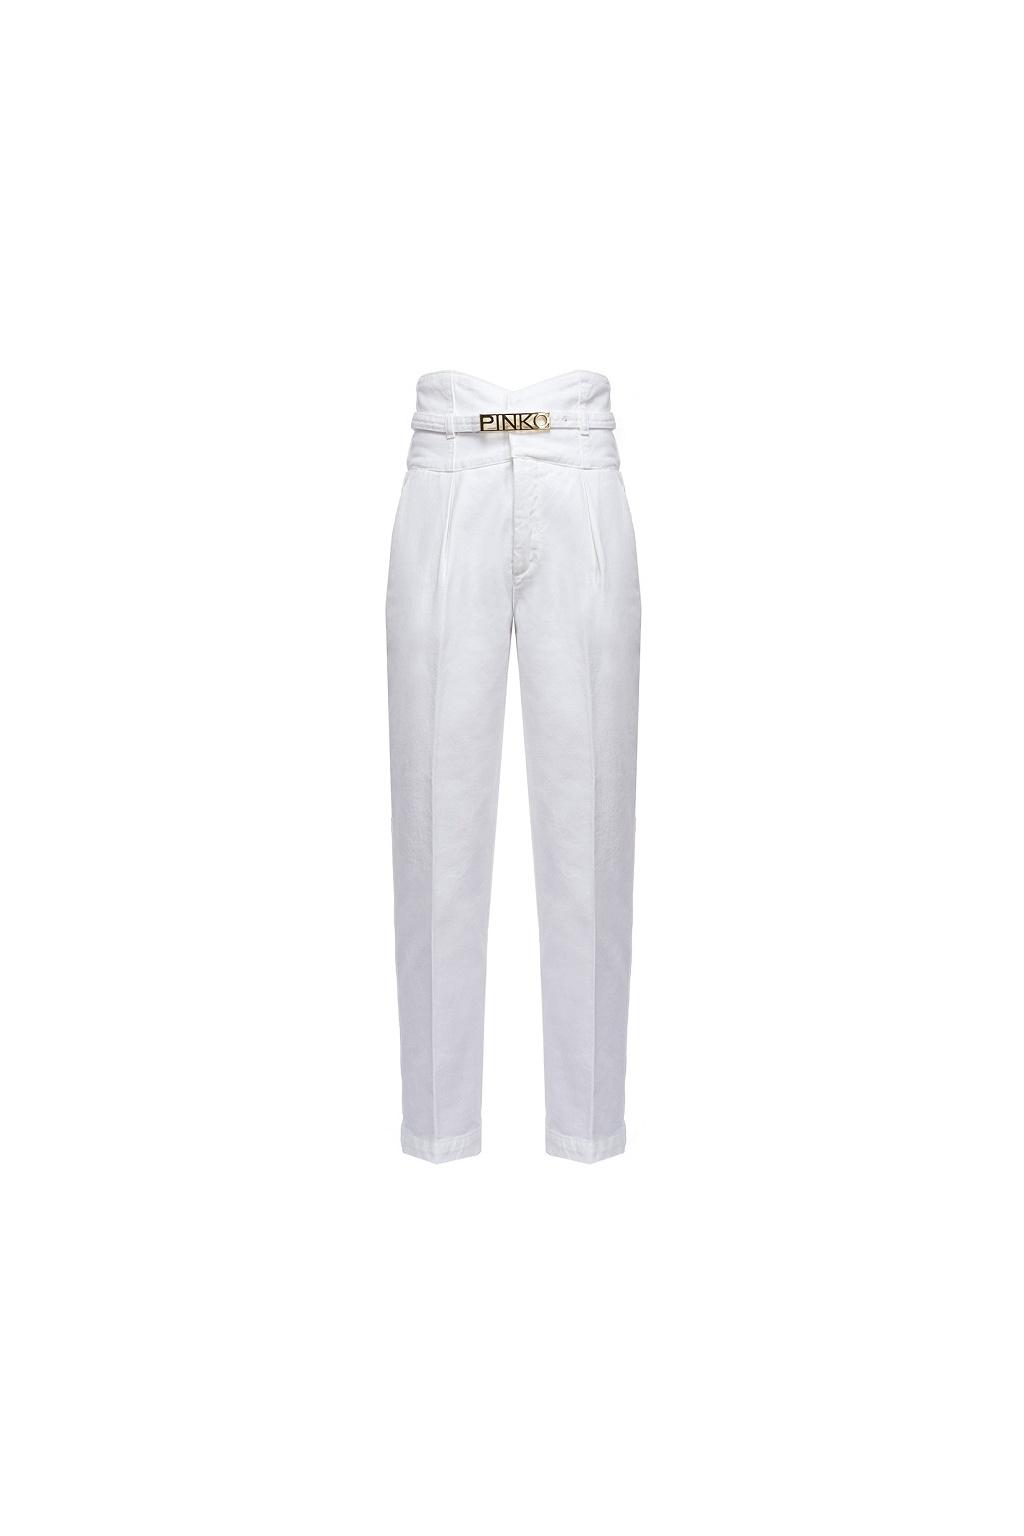 1J10J9Y6FH Z08 Dámské kalhoty  Pinko Ariel 5 Bustier PJ340B bílé